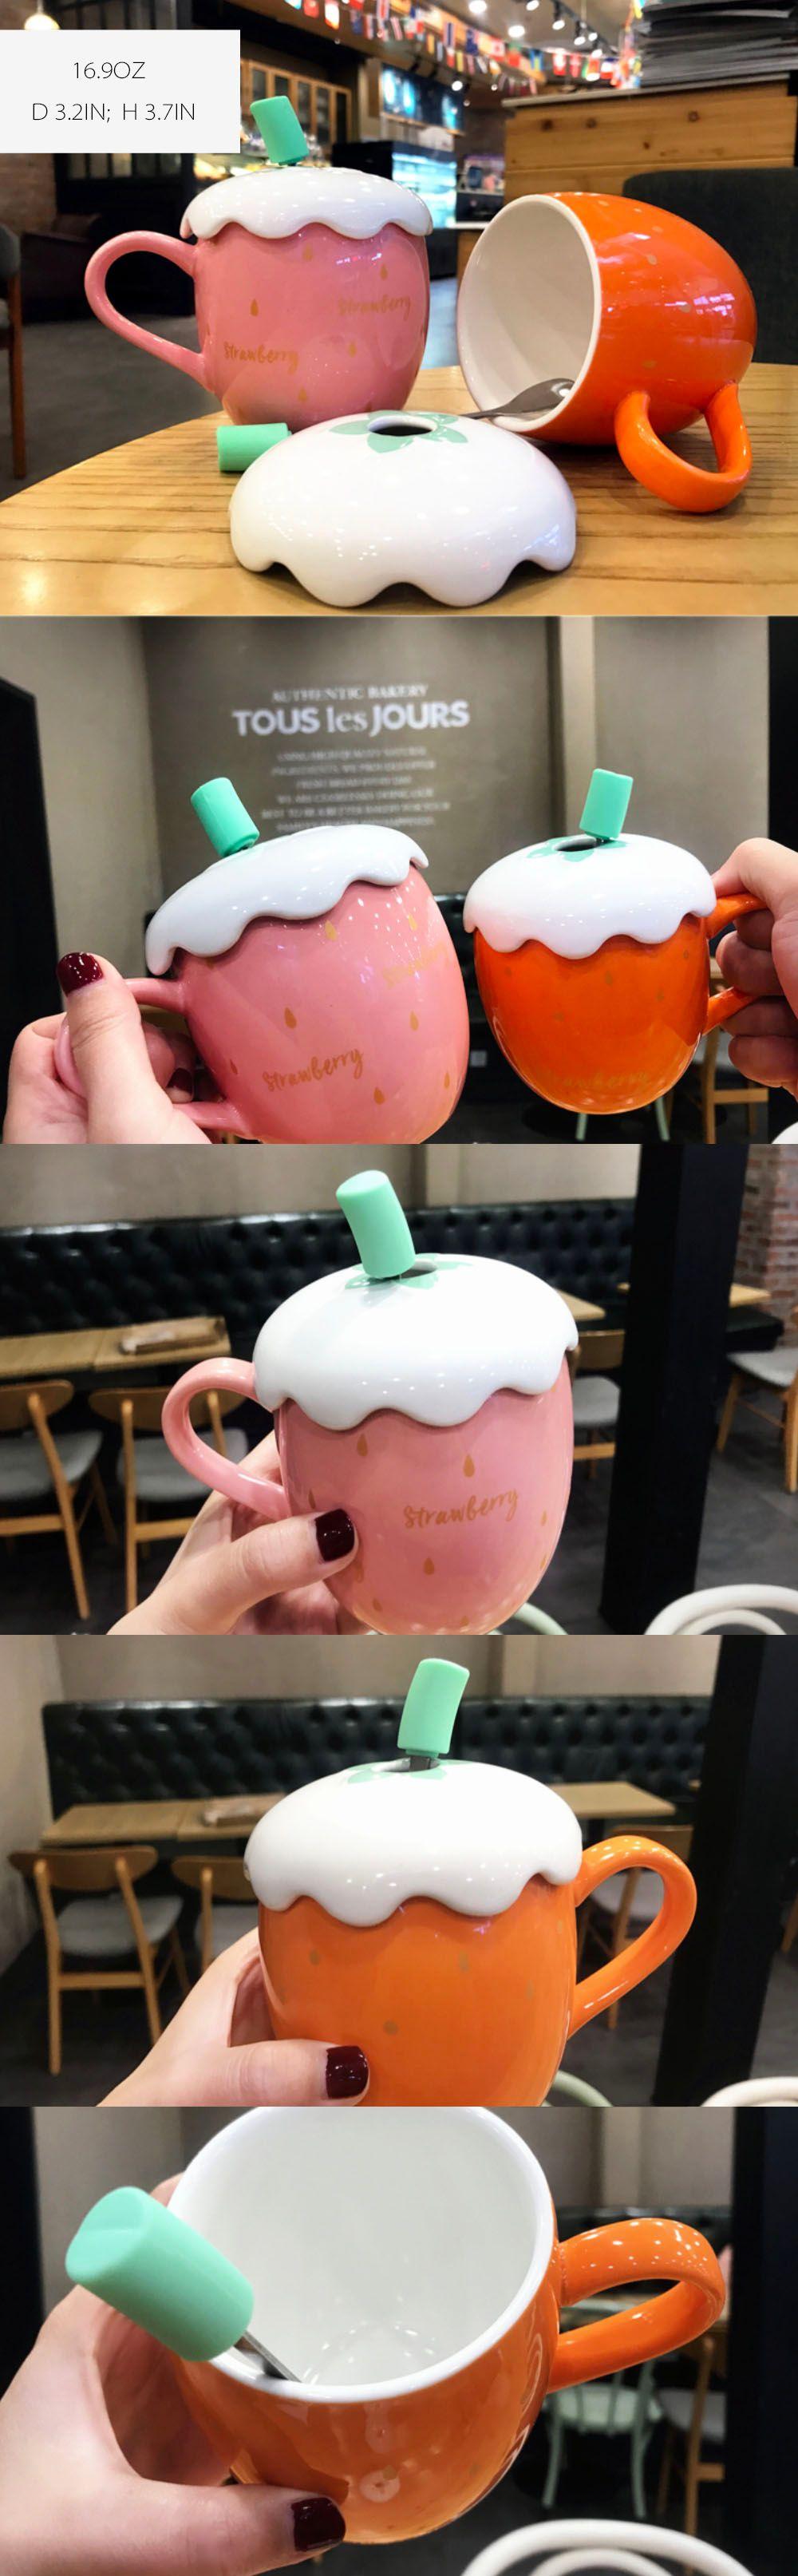 Strawberry Mug Mug & Spoon Set